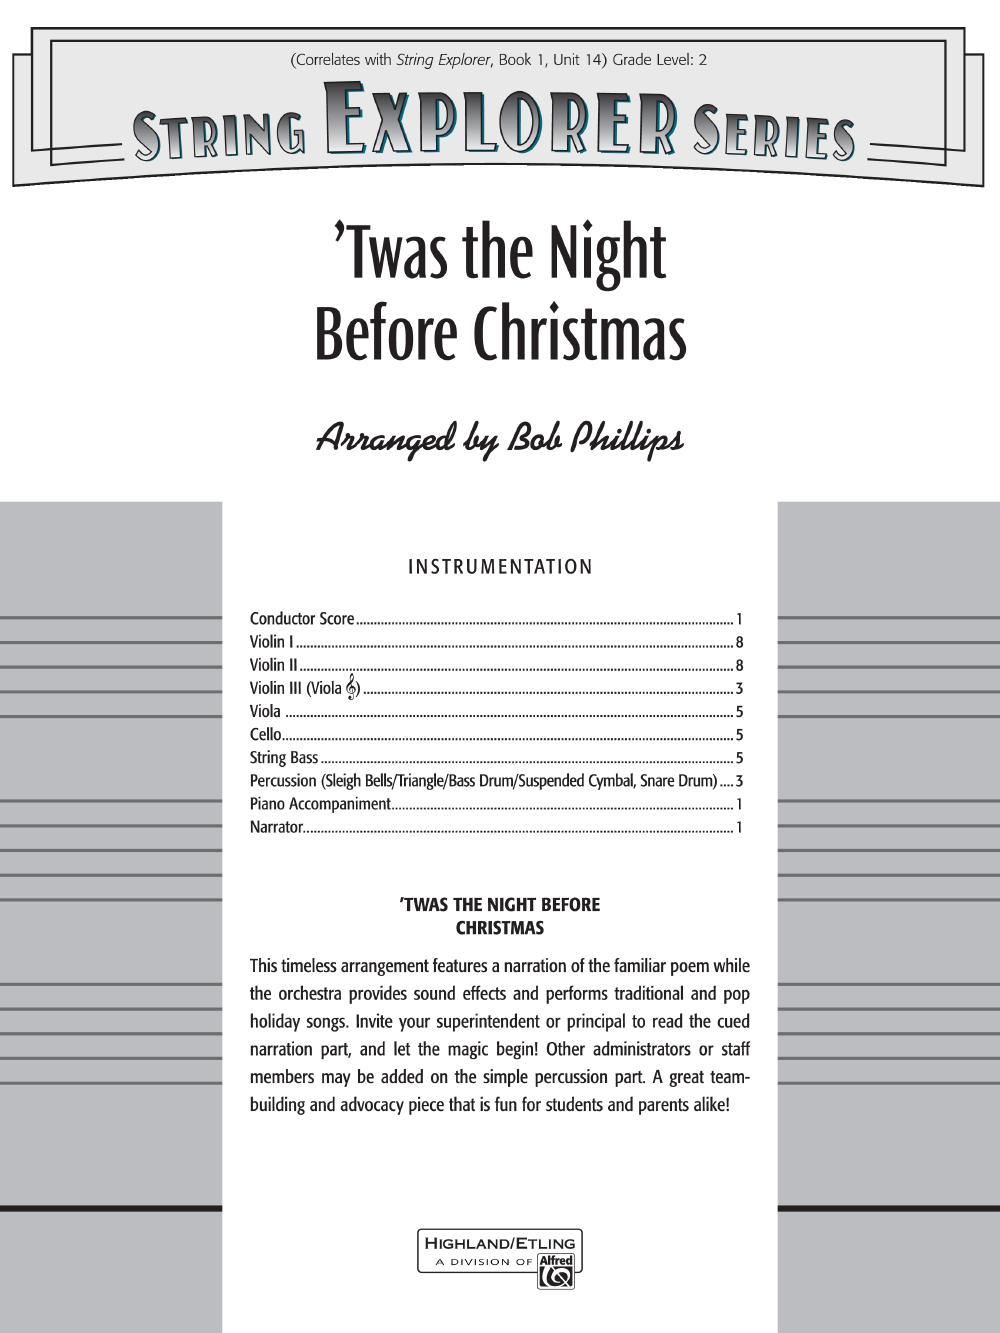 the night before christmas thumbnail